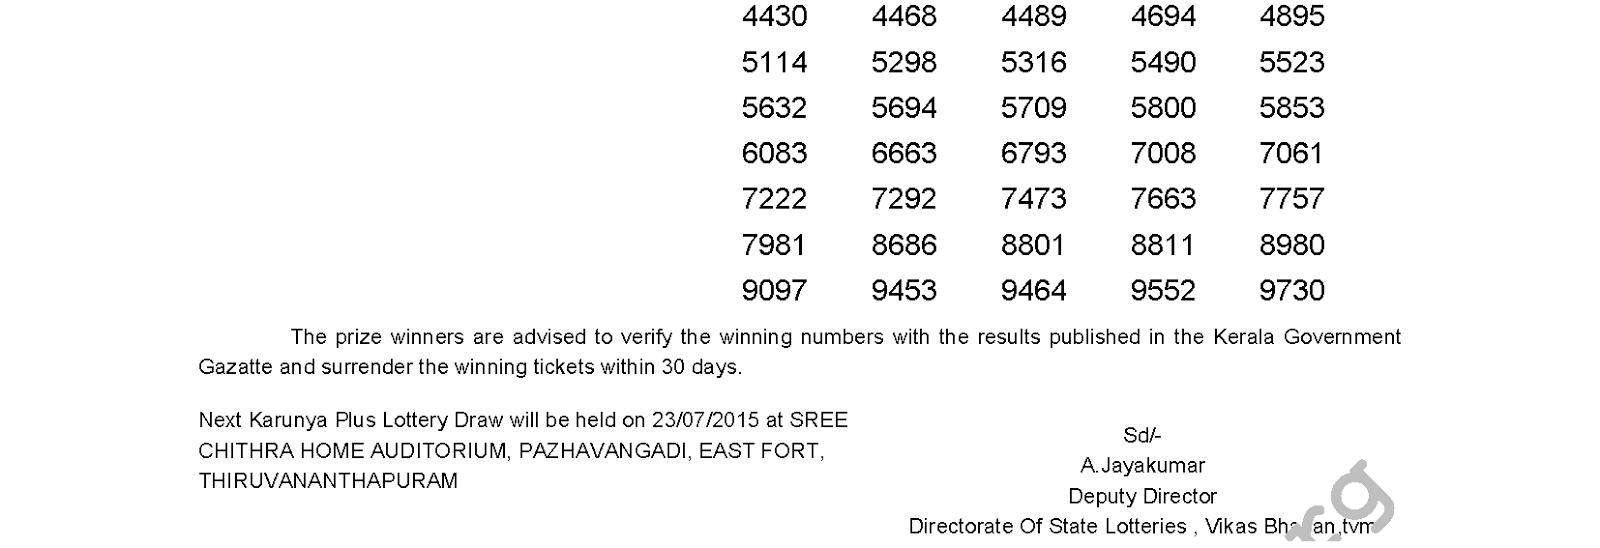 Karunya Plus Lottery KN 66 Result 16-7-2015